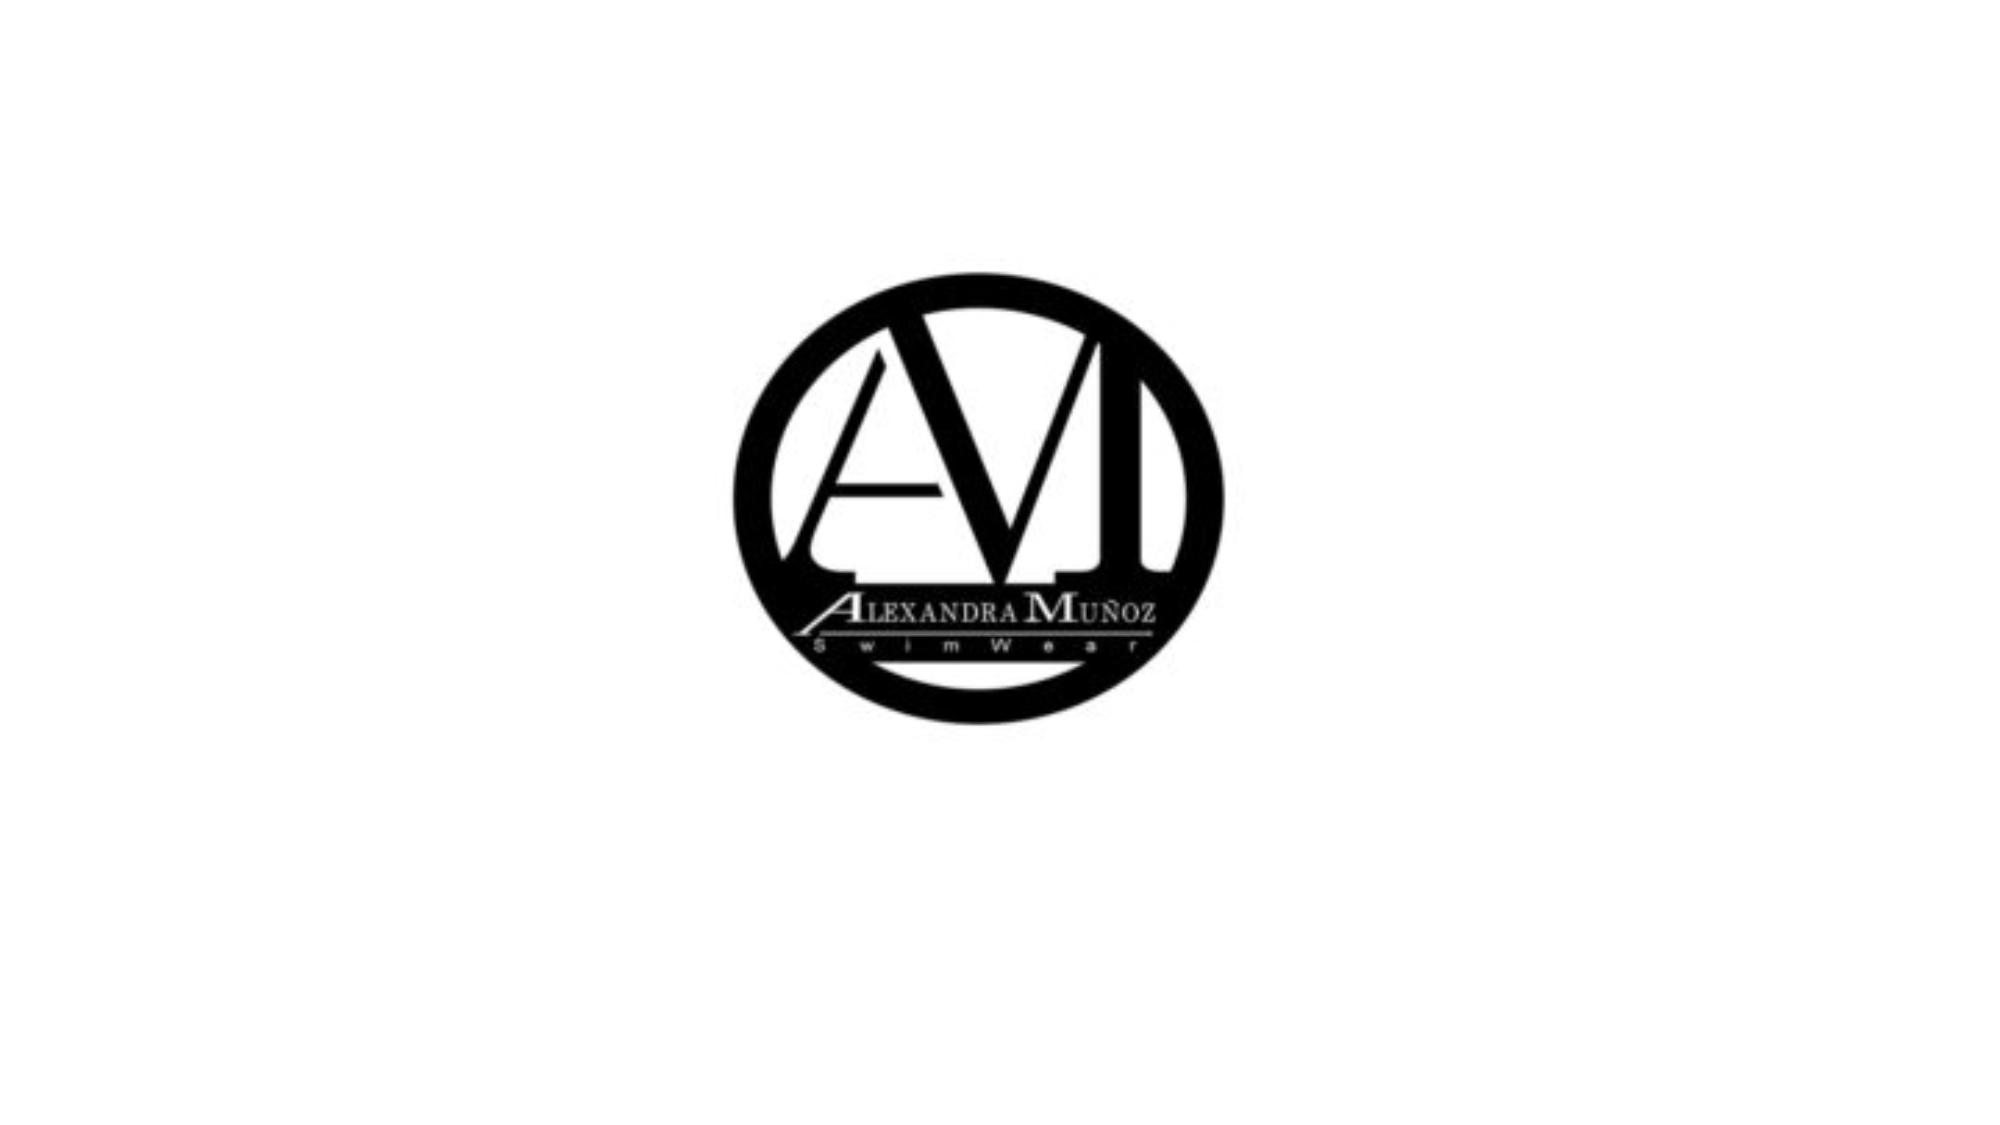 patrocinantes-alexandra-muñoz